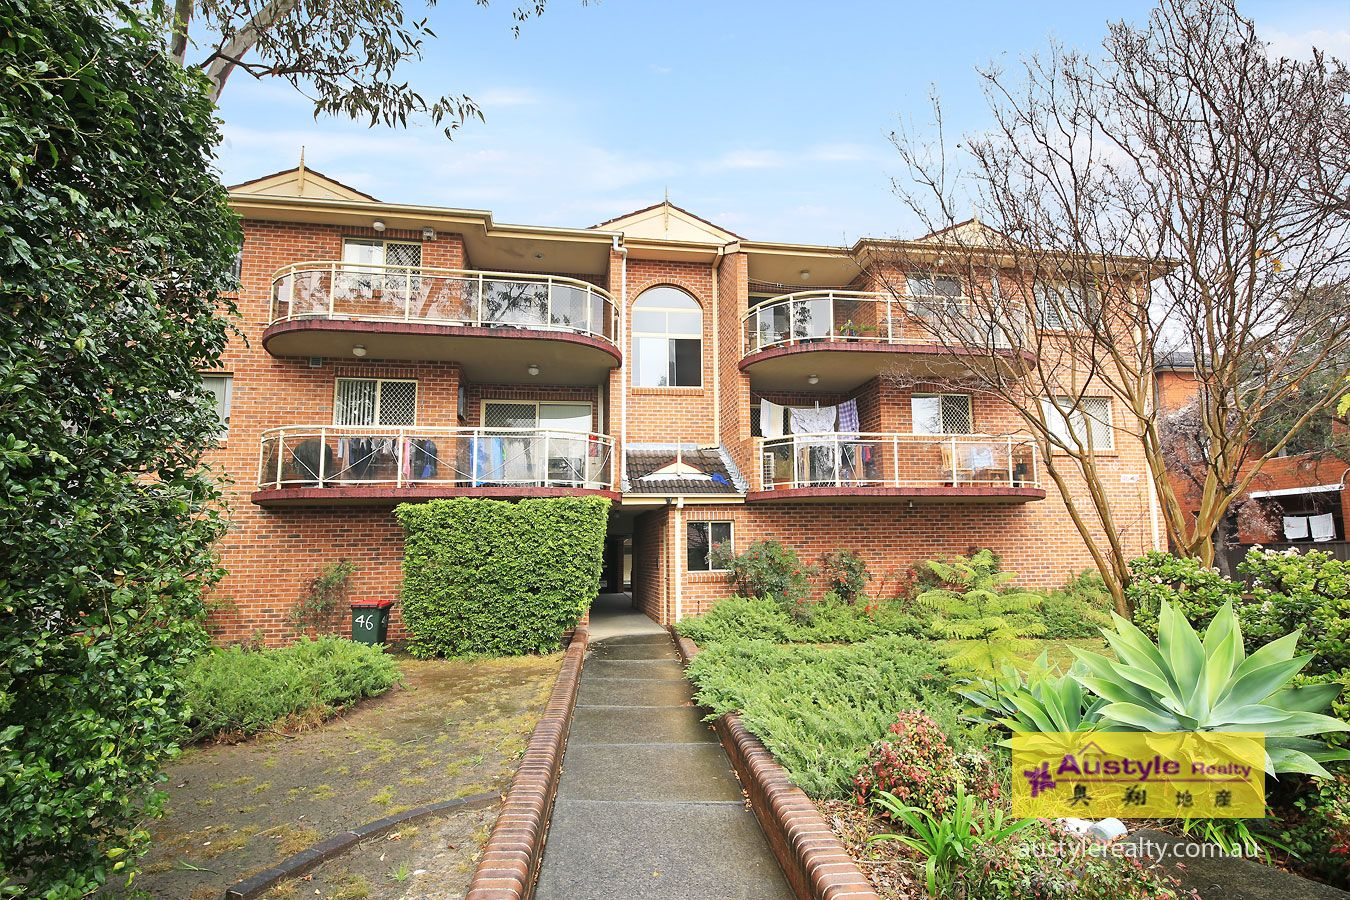 10/46-48 Prospect St, Rosehill NSW 2142, Image 0